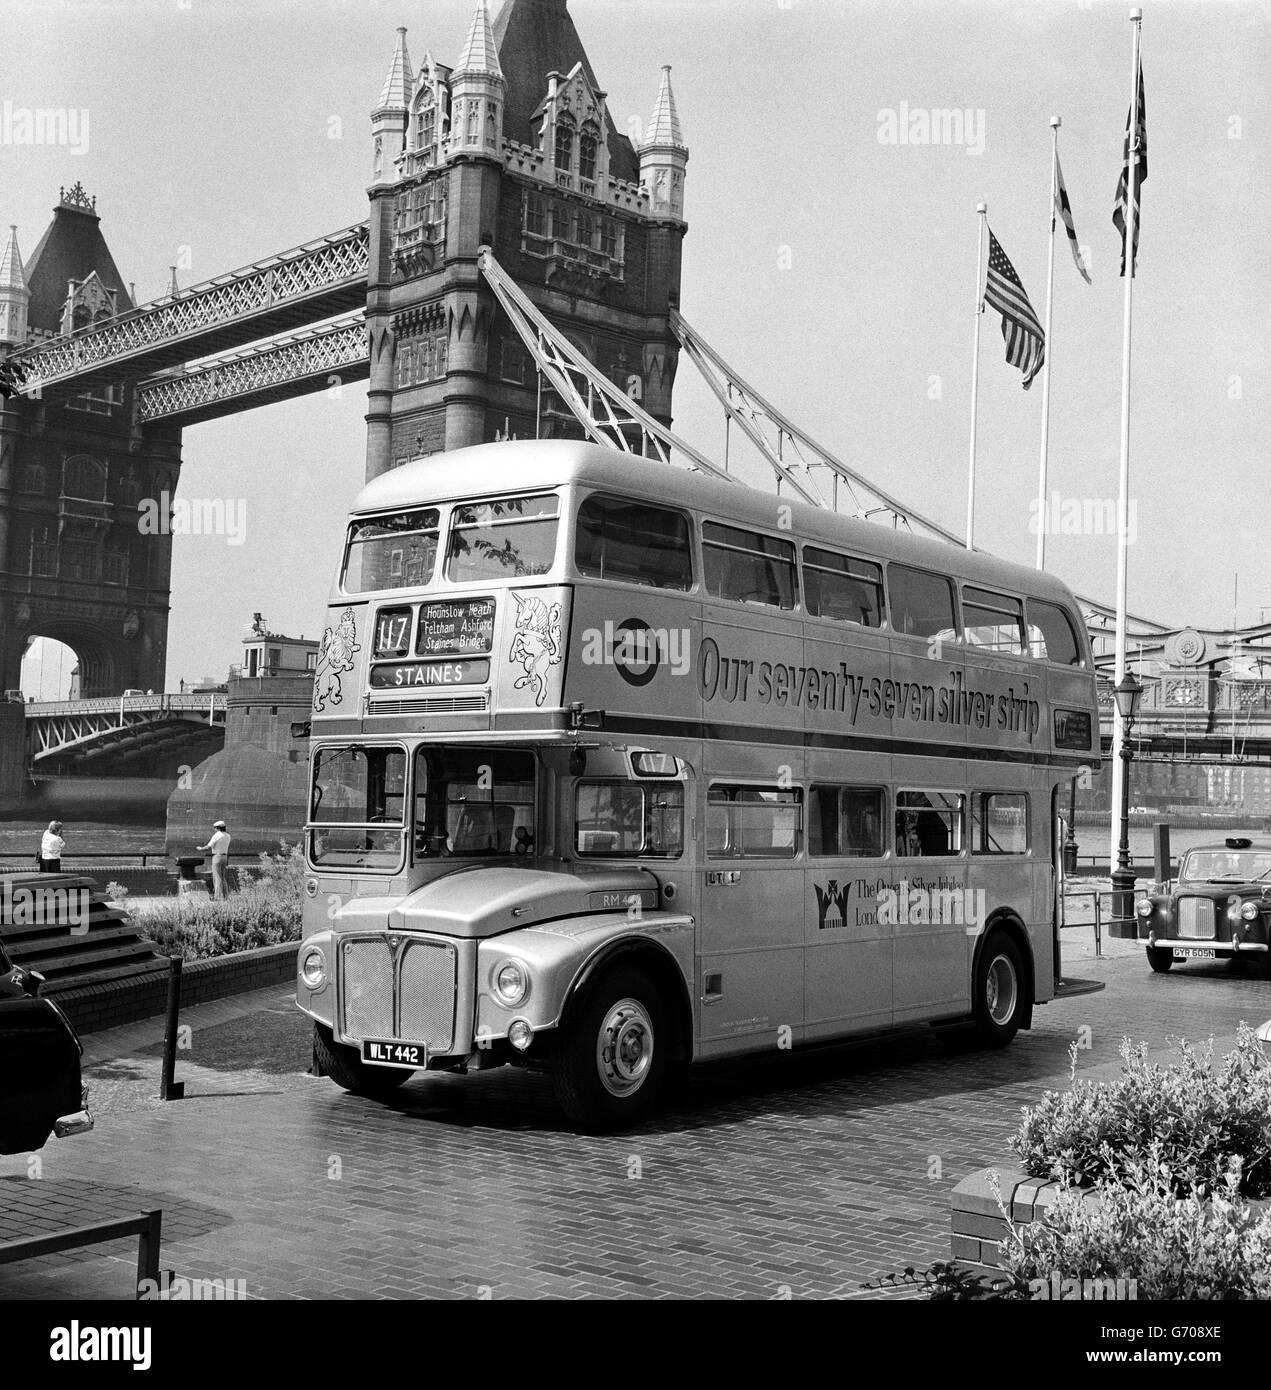 British Transport - Road - Buses - London - 1976 - Stock Image